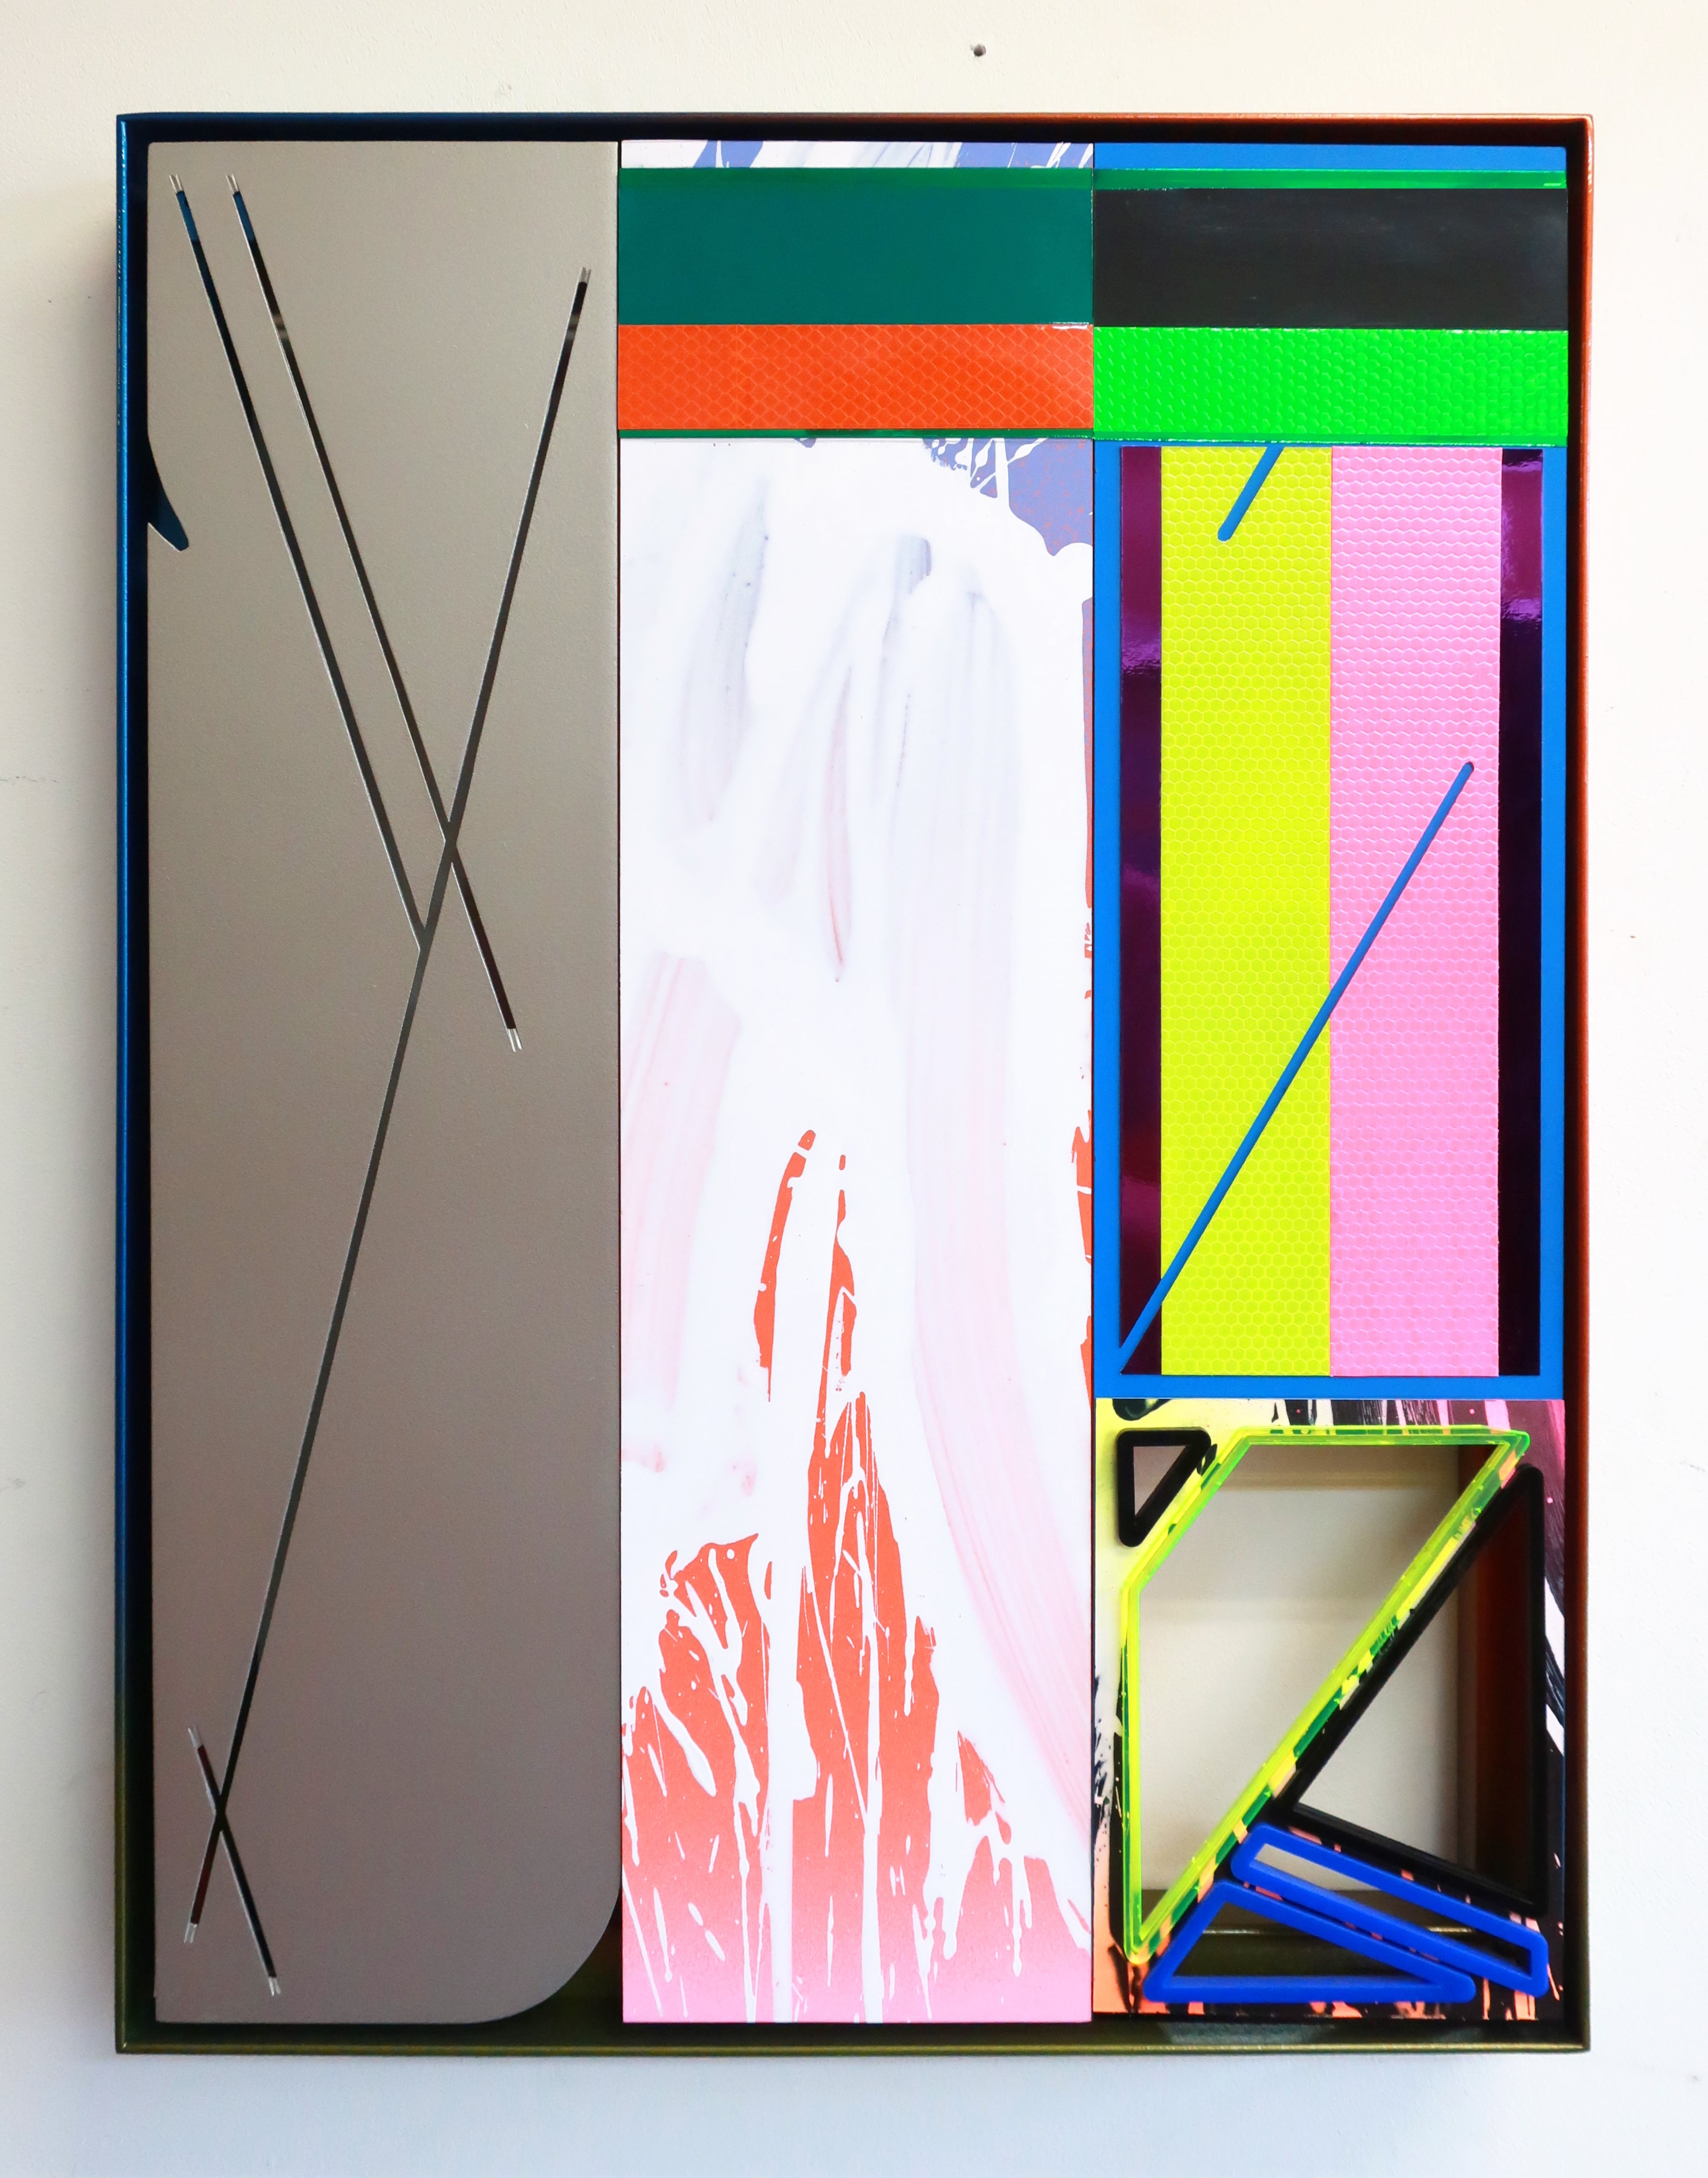 NemesM_Police-Party-06_2019_55x40cm_steel-carpaint-aluminium-foamex-PVC-acrylic-light-reflective-vinyl-mirror-paper-lasercut-perspex-min